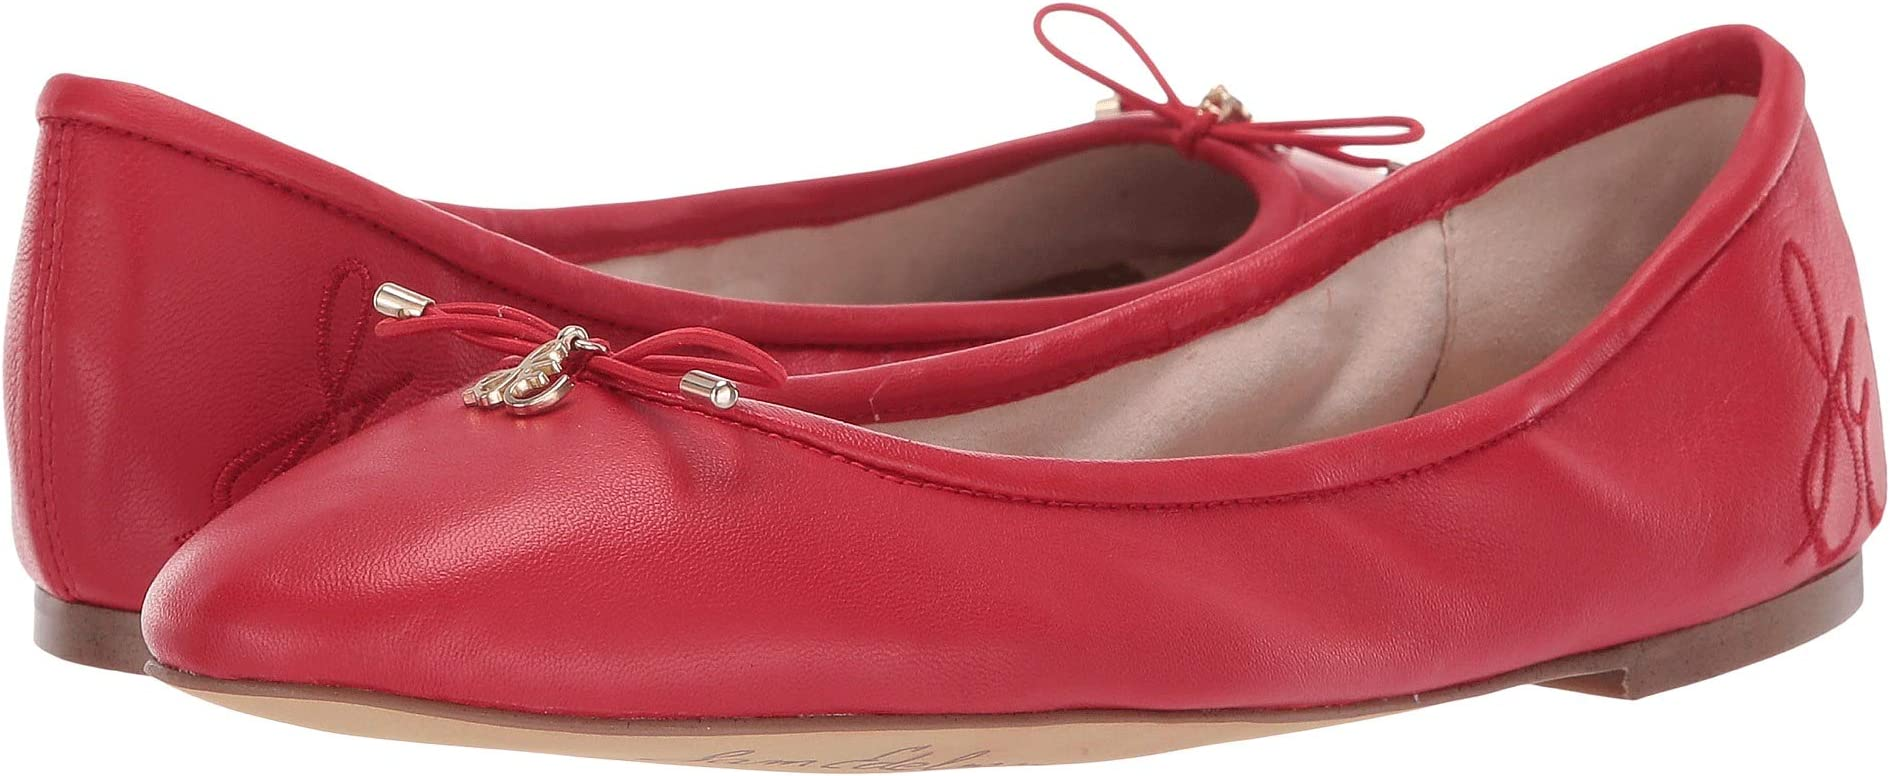 2f53aa356 Sam Edelman Boots